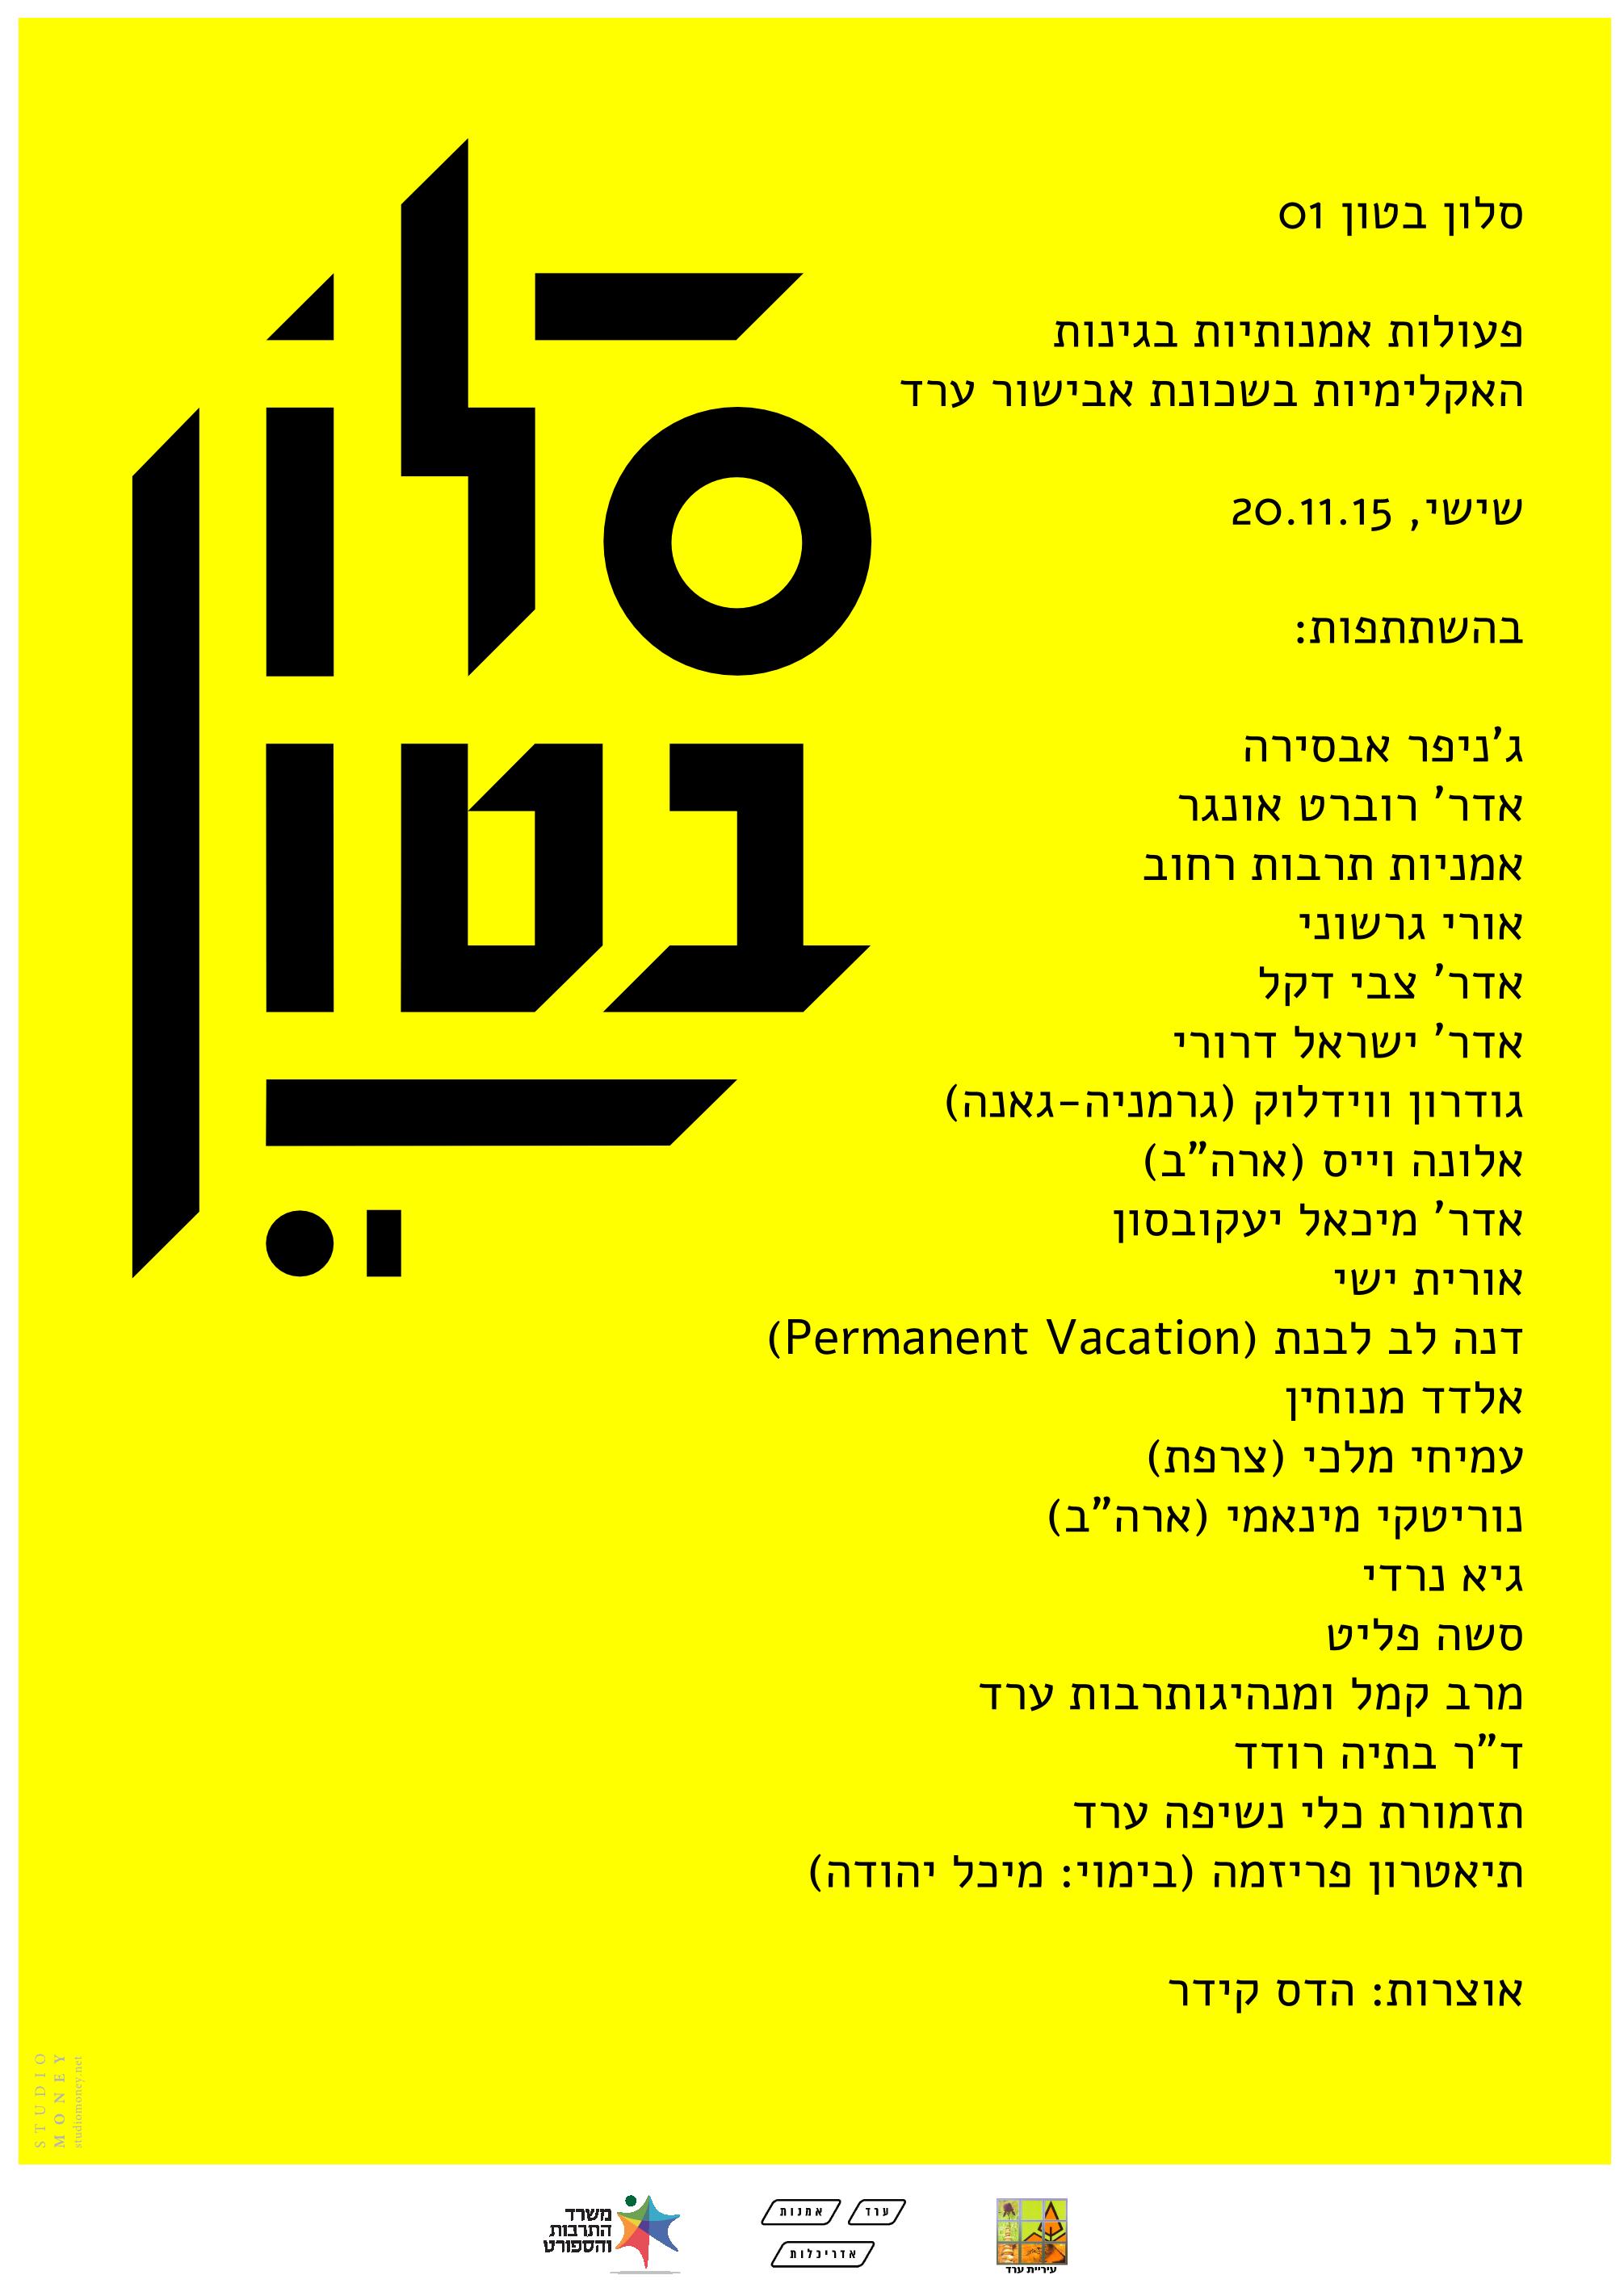 Salon Beton Poster (1)